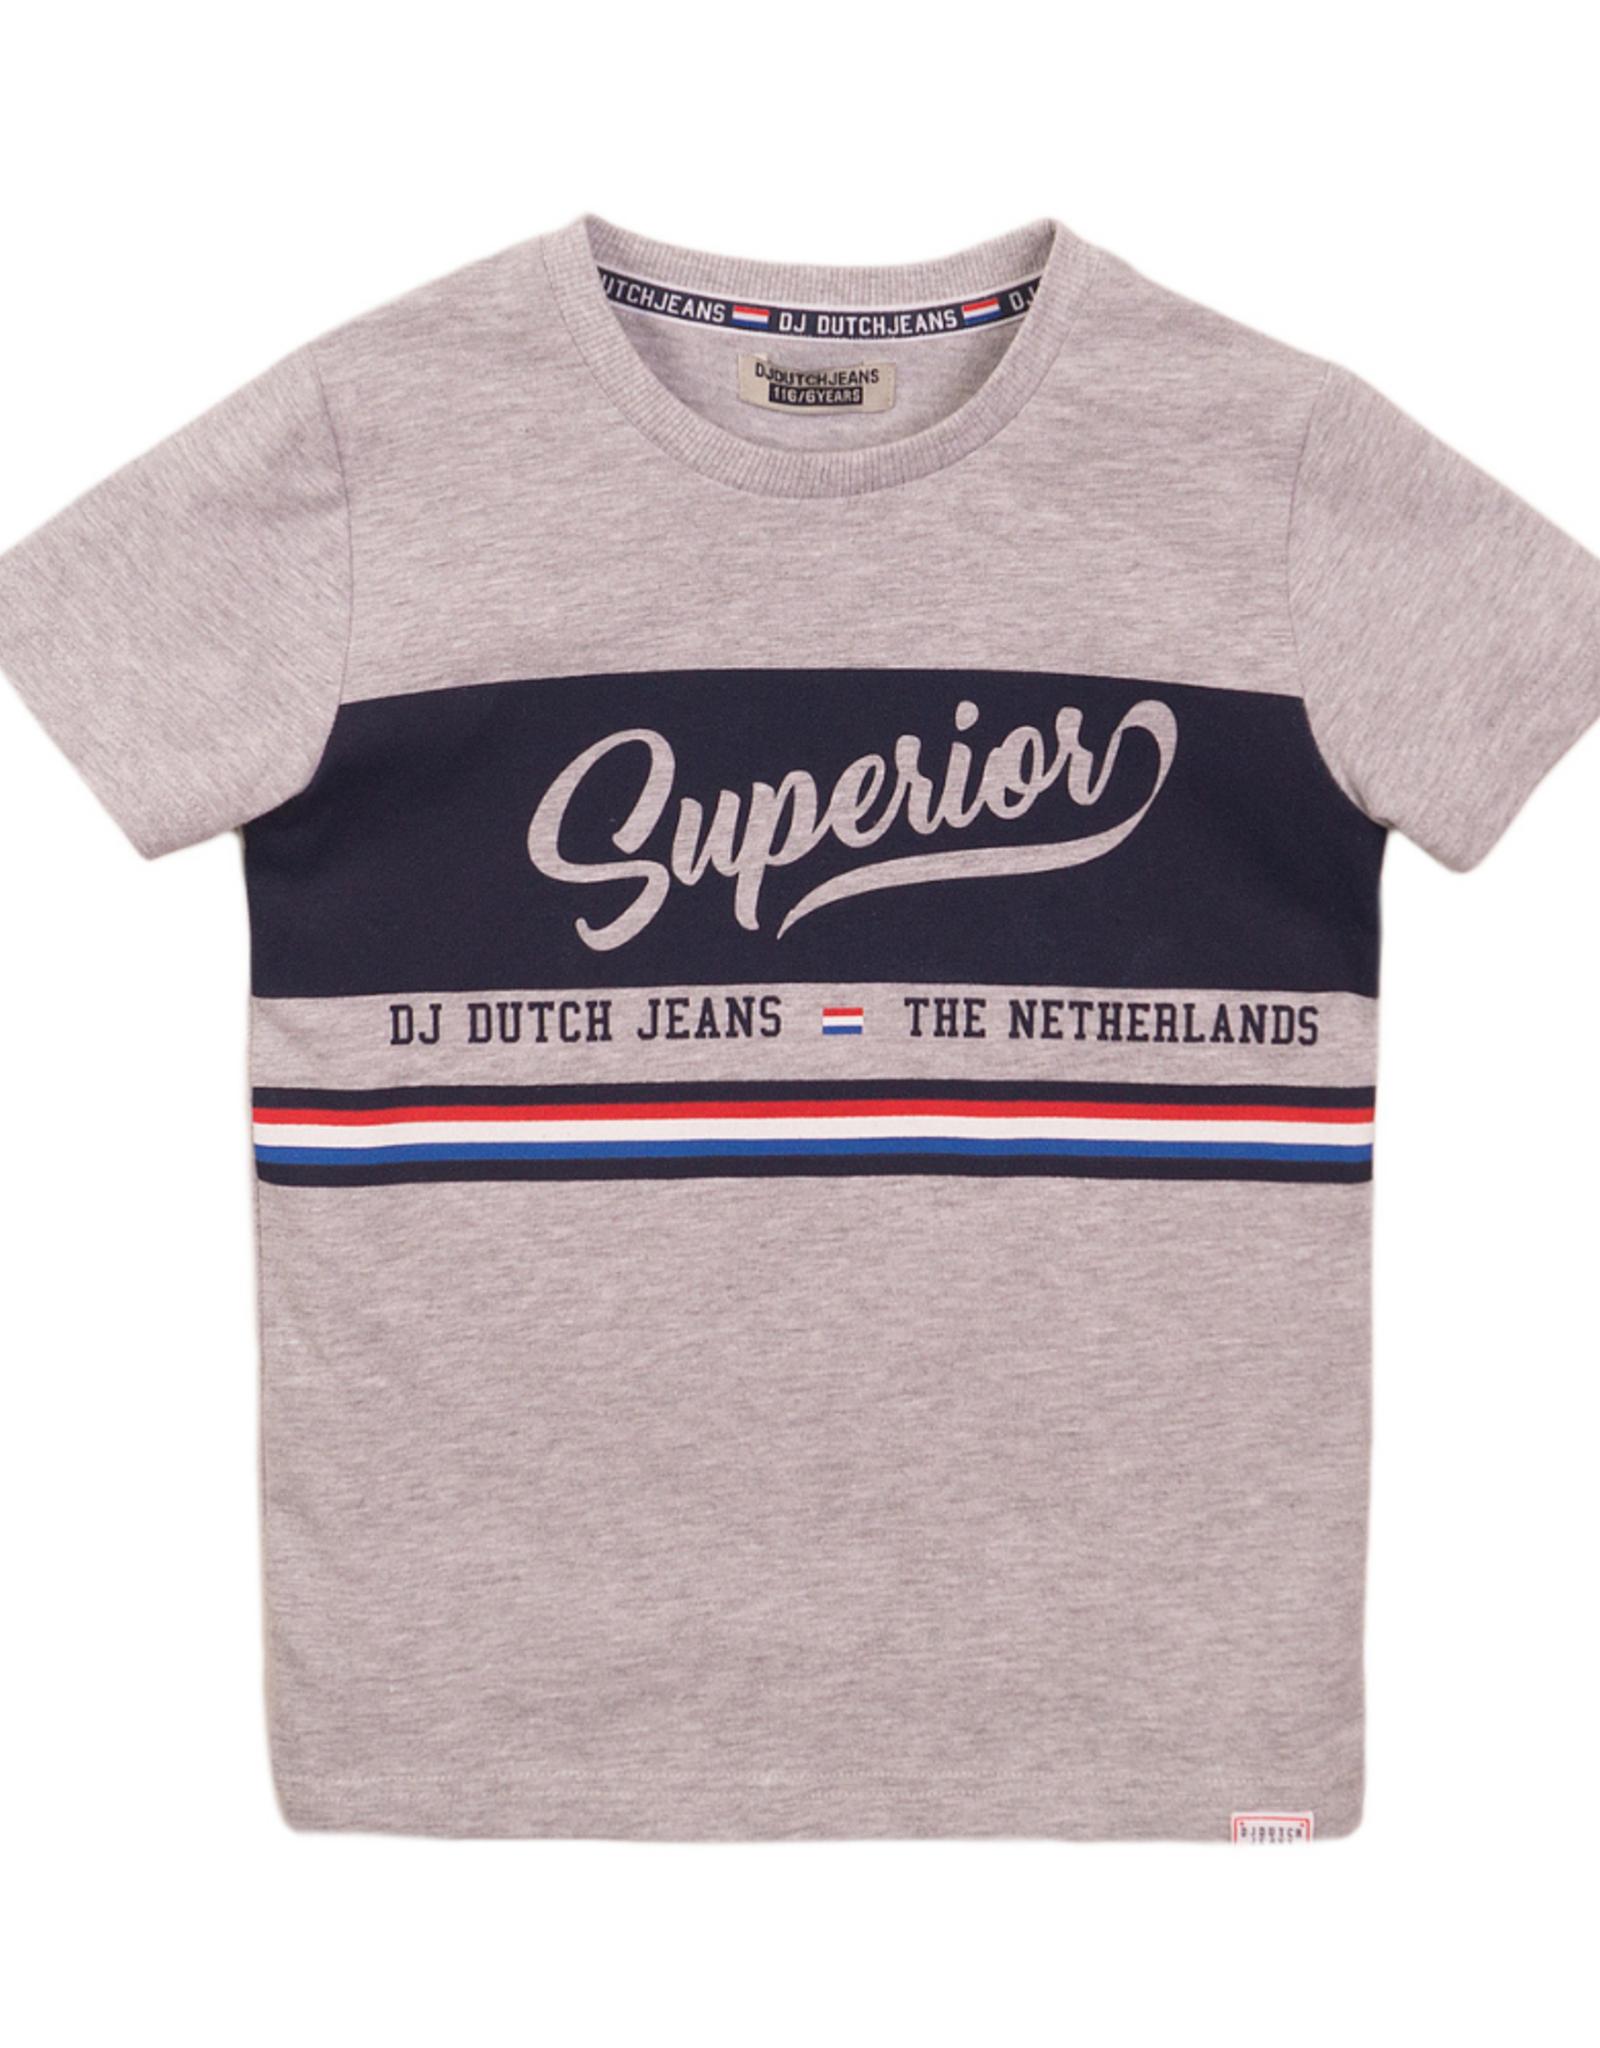 DJ Dutchjeans DJ DUTCHJEANS shirt E38150-45